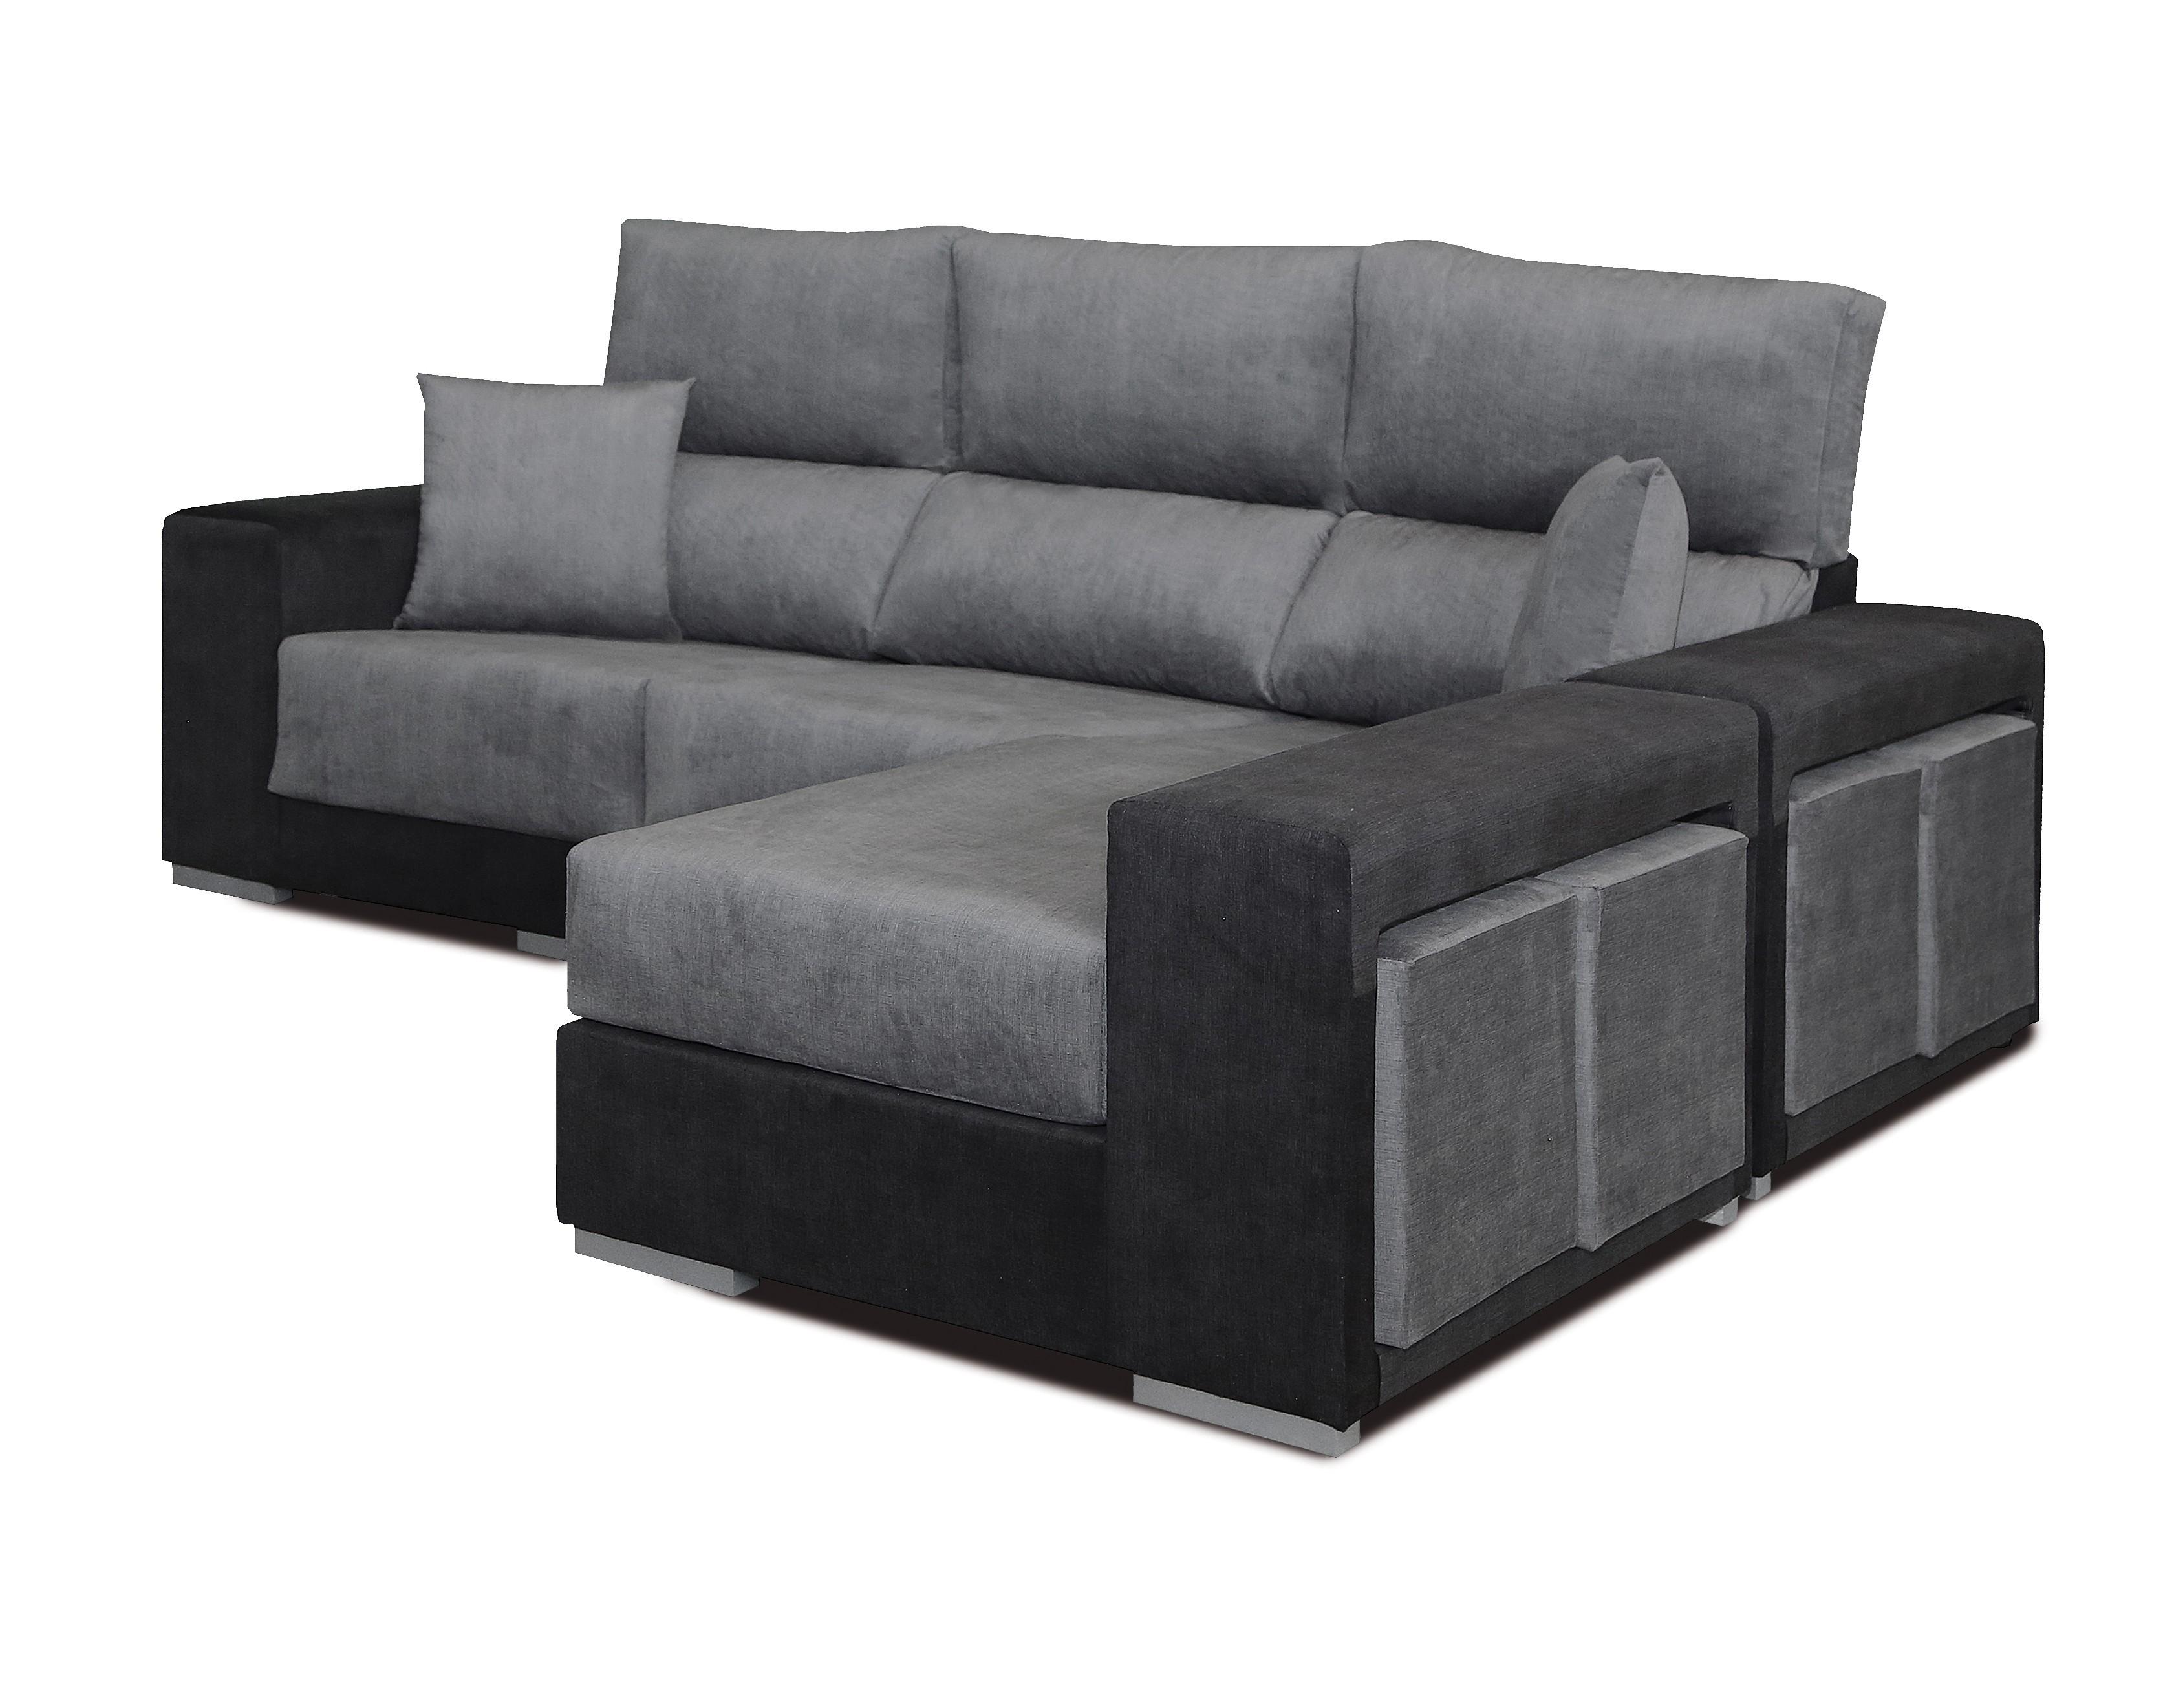 Sof s y tresillos en madrid muebles combar for Muebles totana